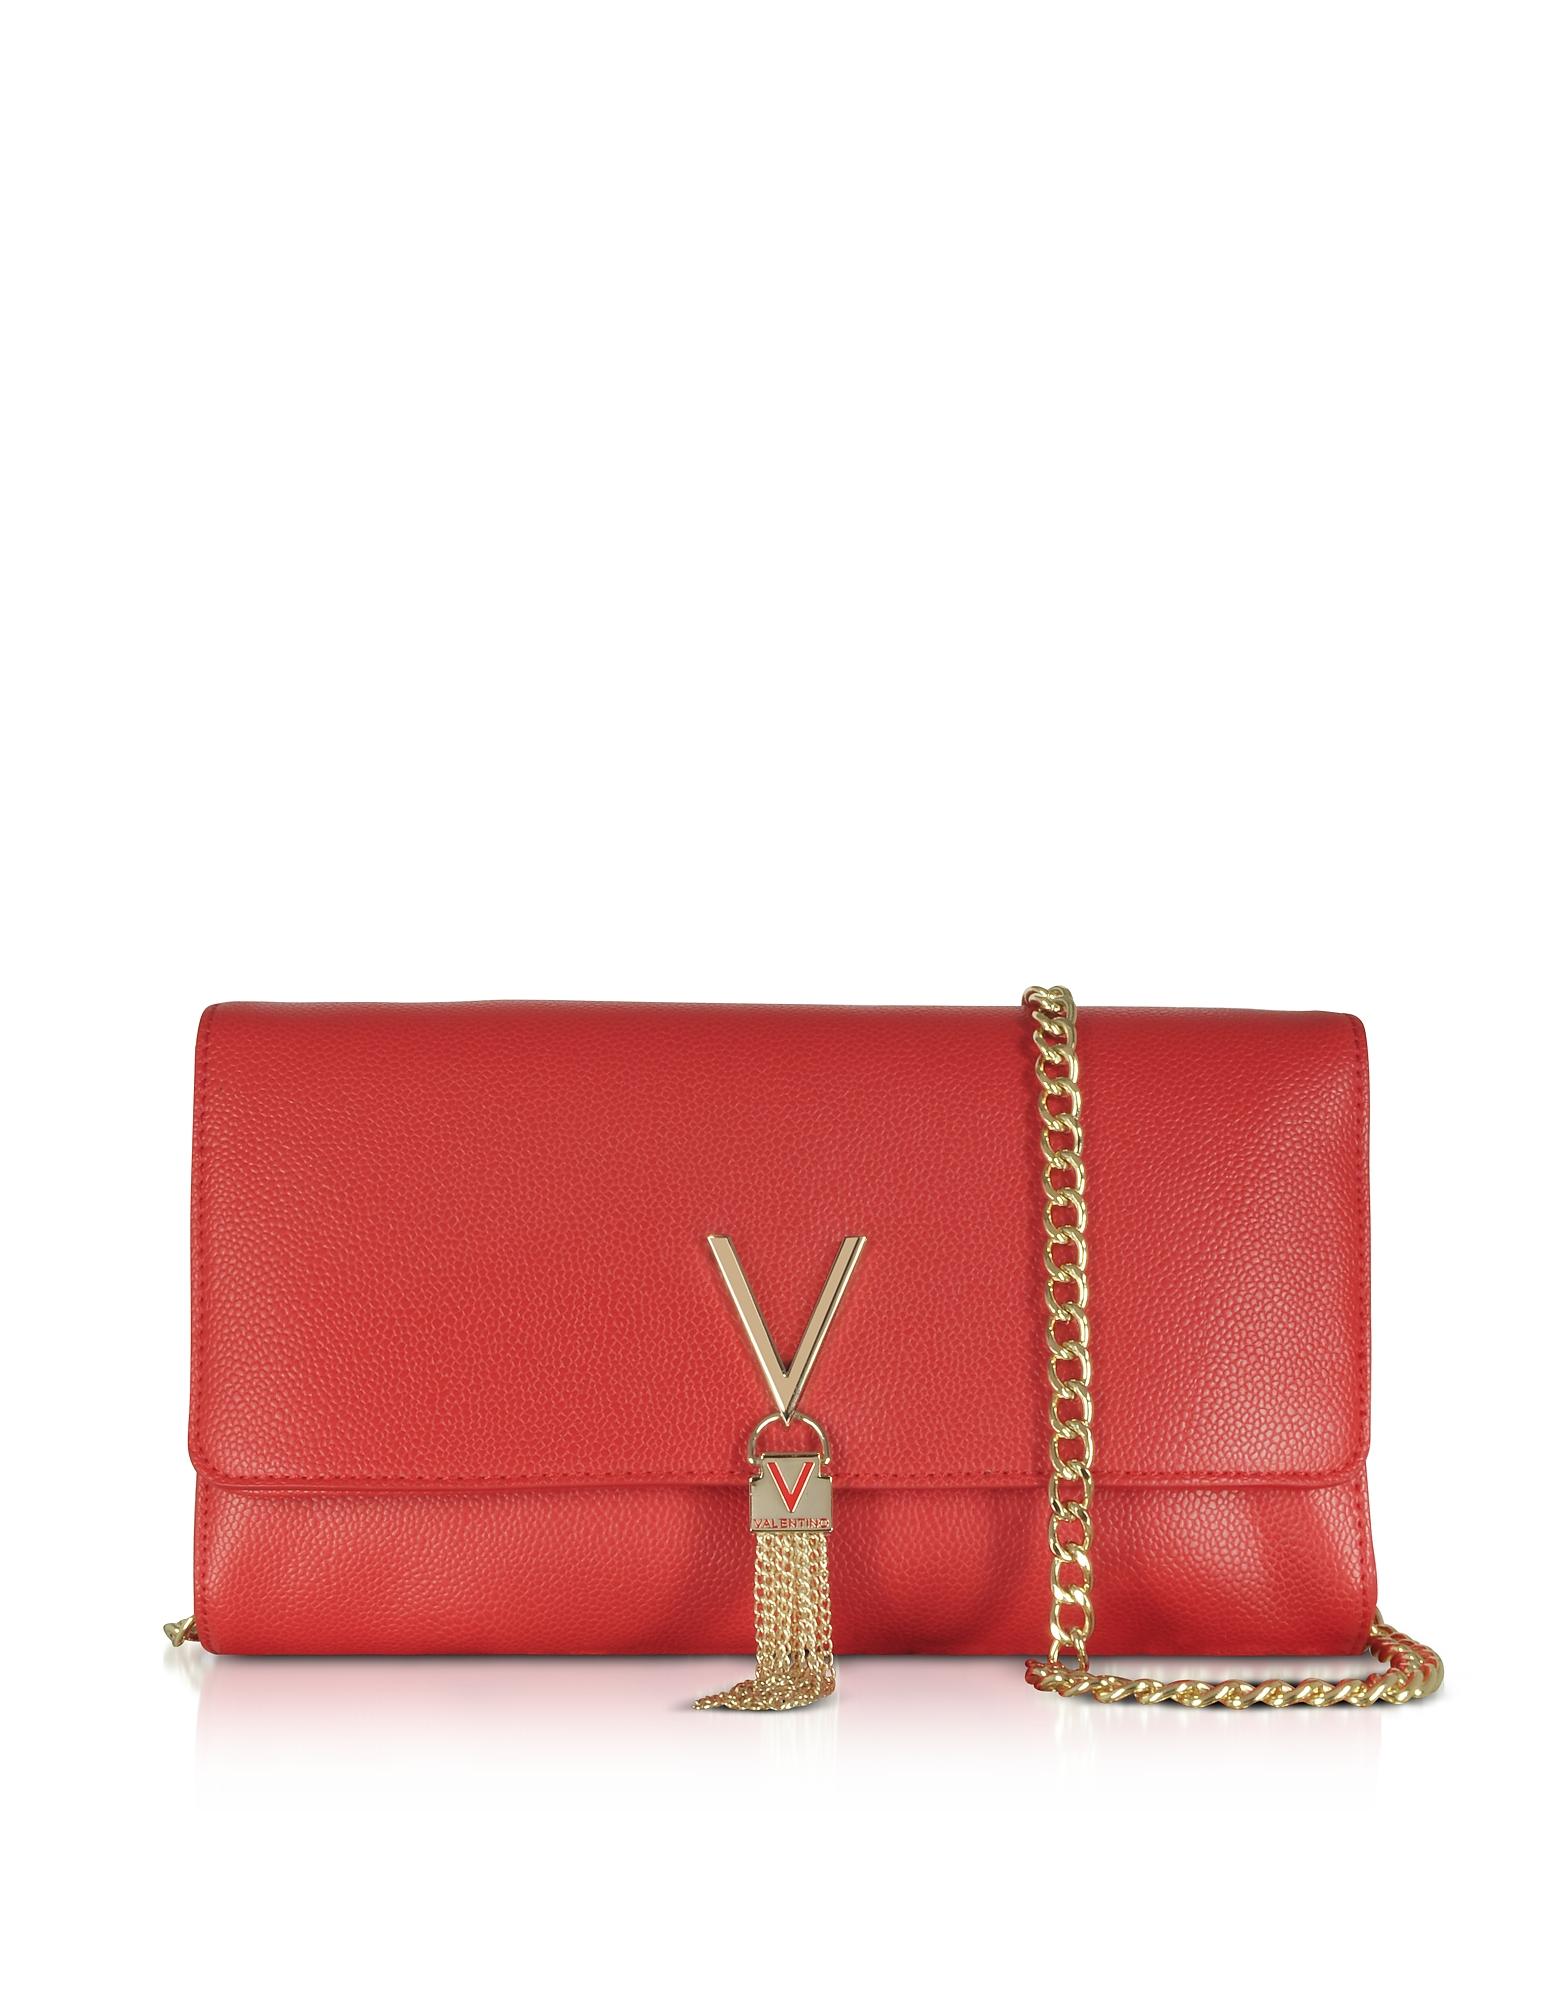 Valentino by Mario Valentino Designer Handbags, Lizard Embossed Eco Leather Divina Shoulder Bag